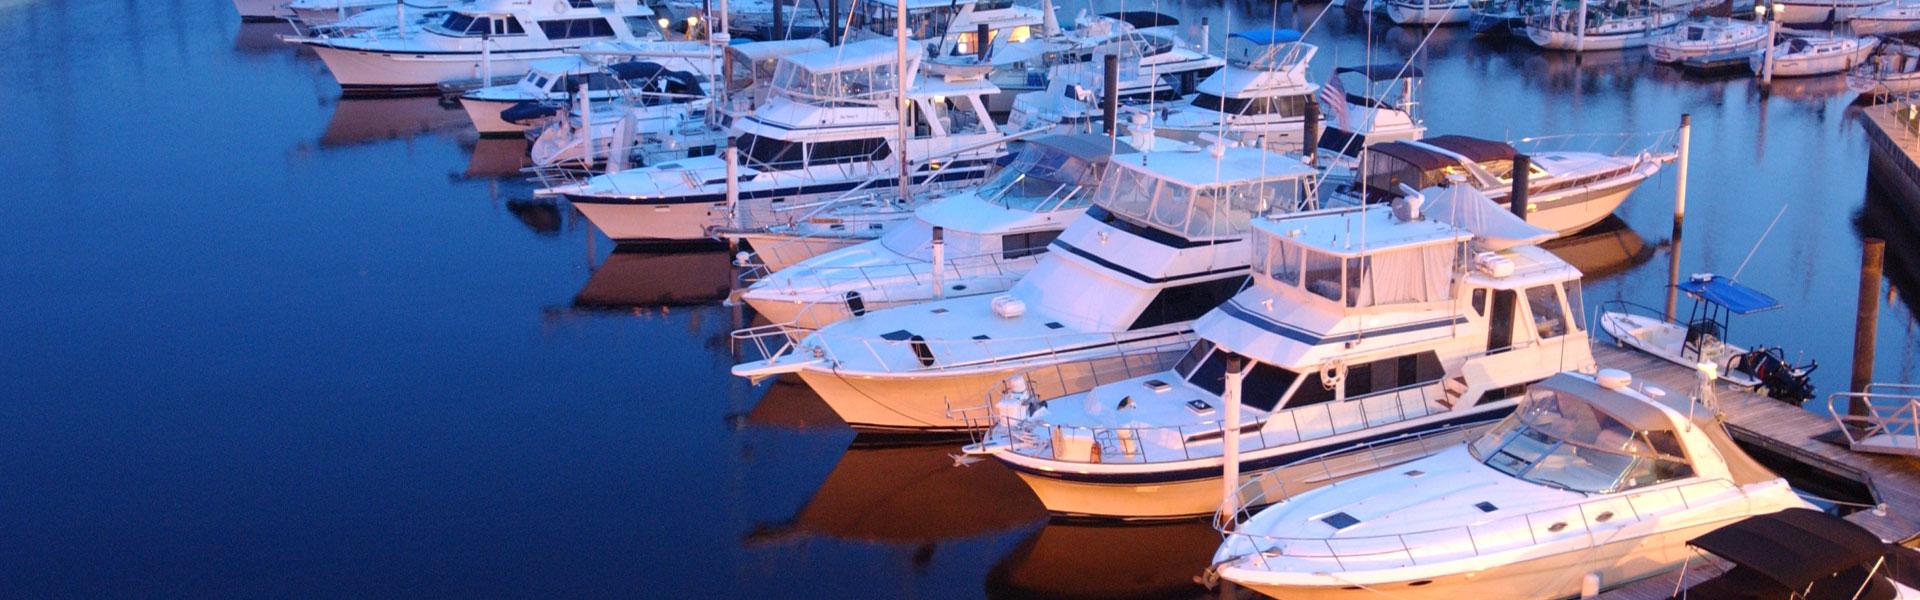 Cruise The Neuse Pontoon Boat Tours New Bern Nc